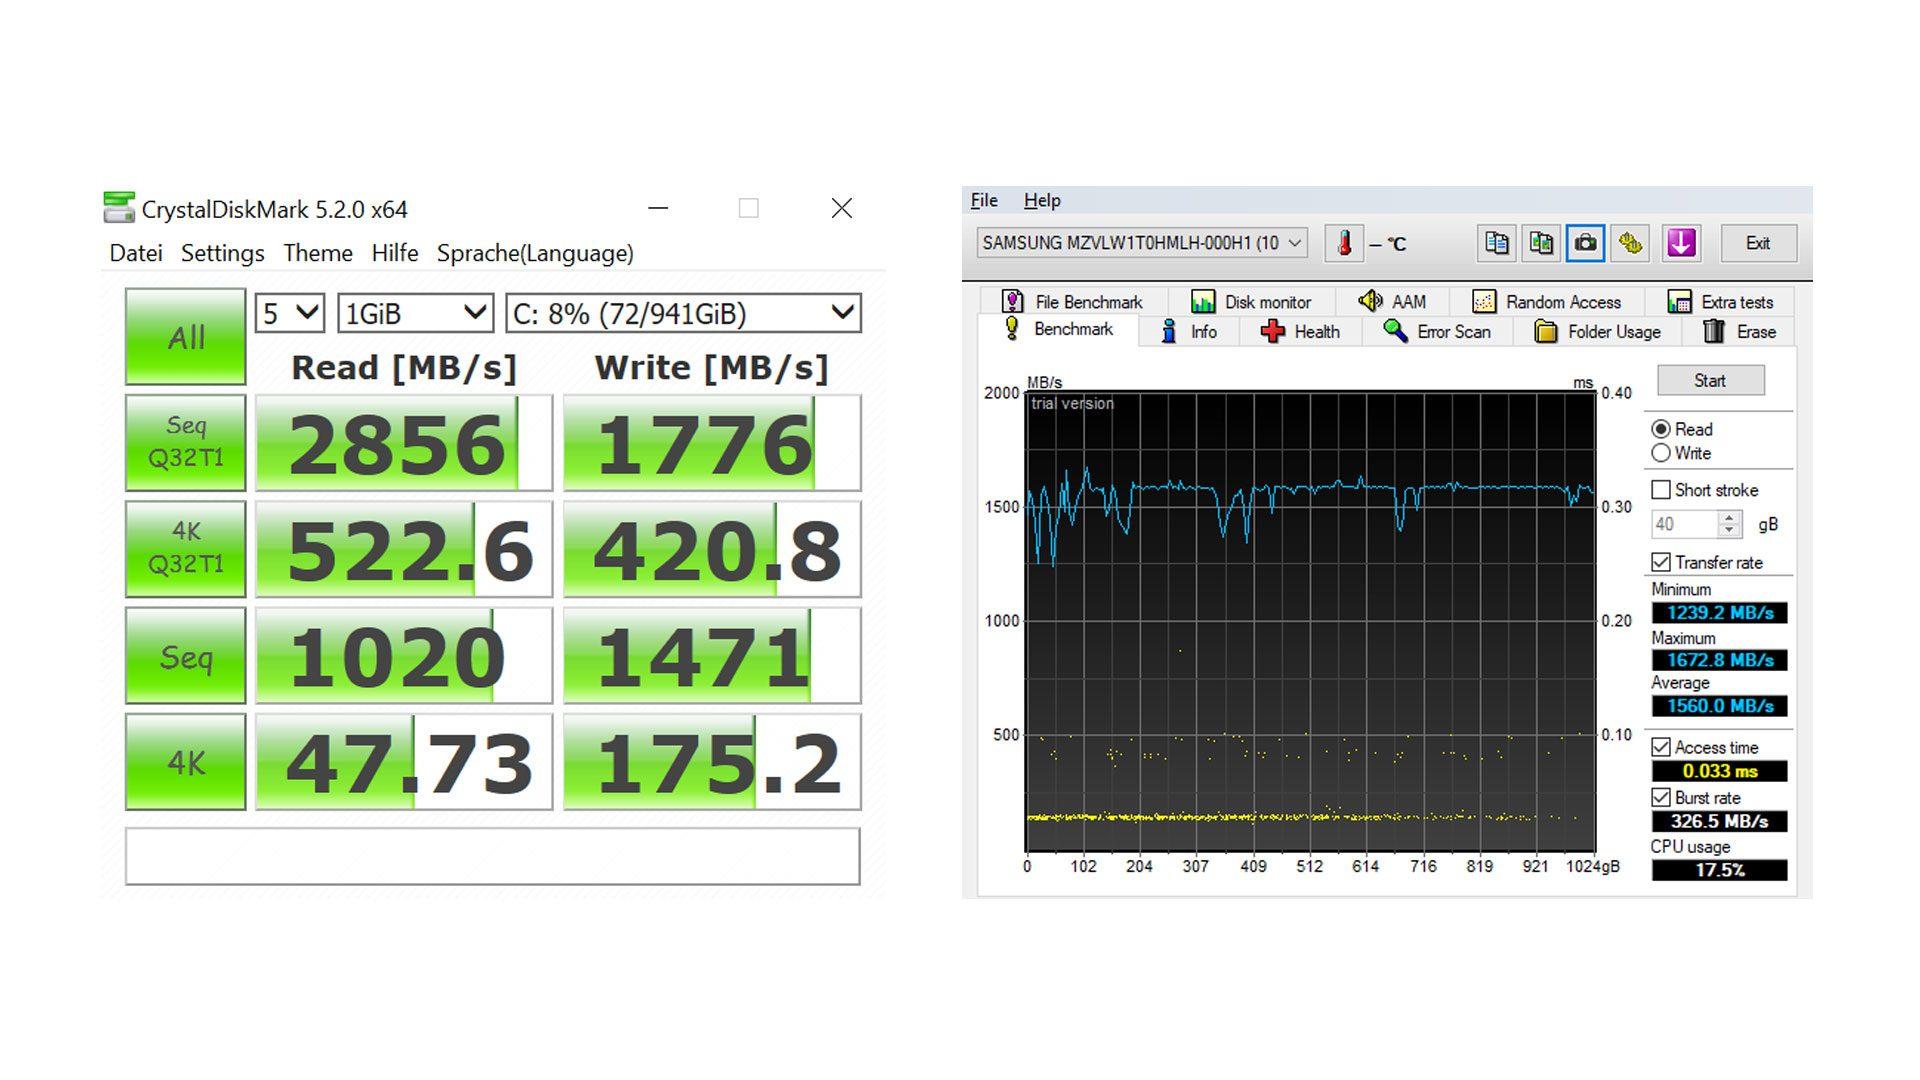 HP-Spectre-x360-13-ac002ng_Benchmark-7